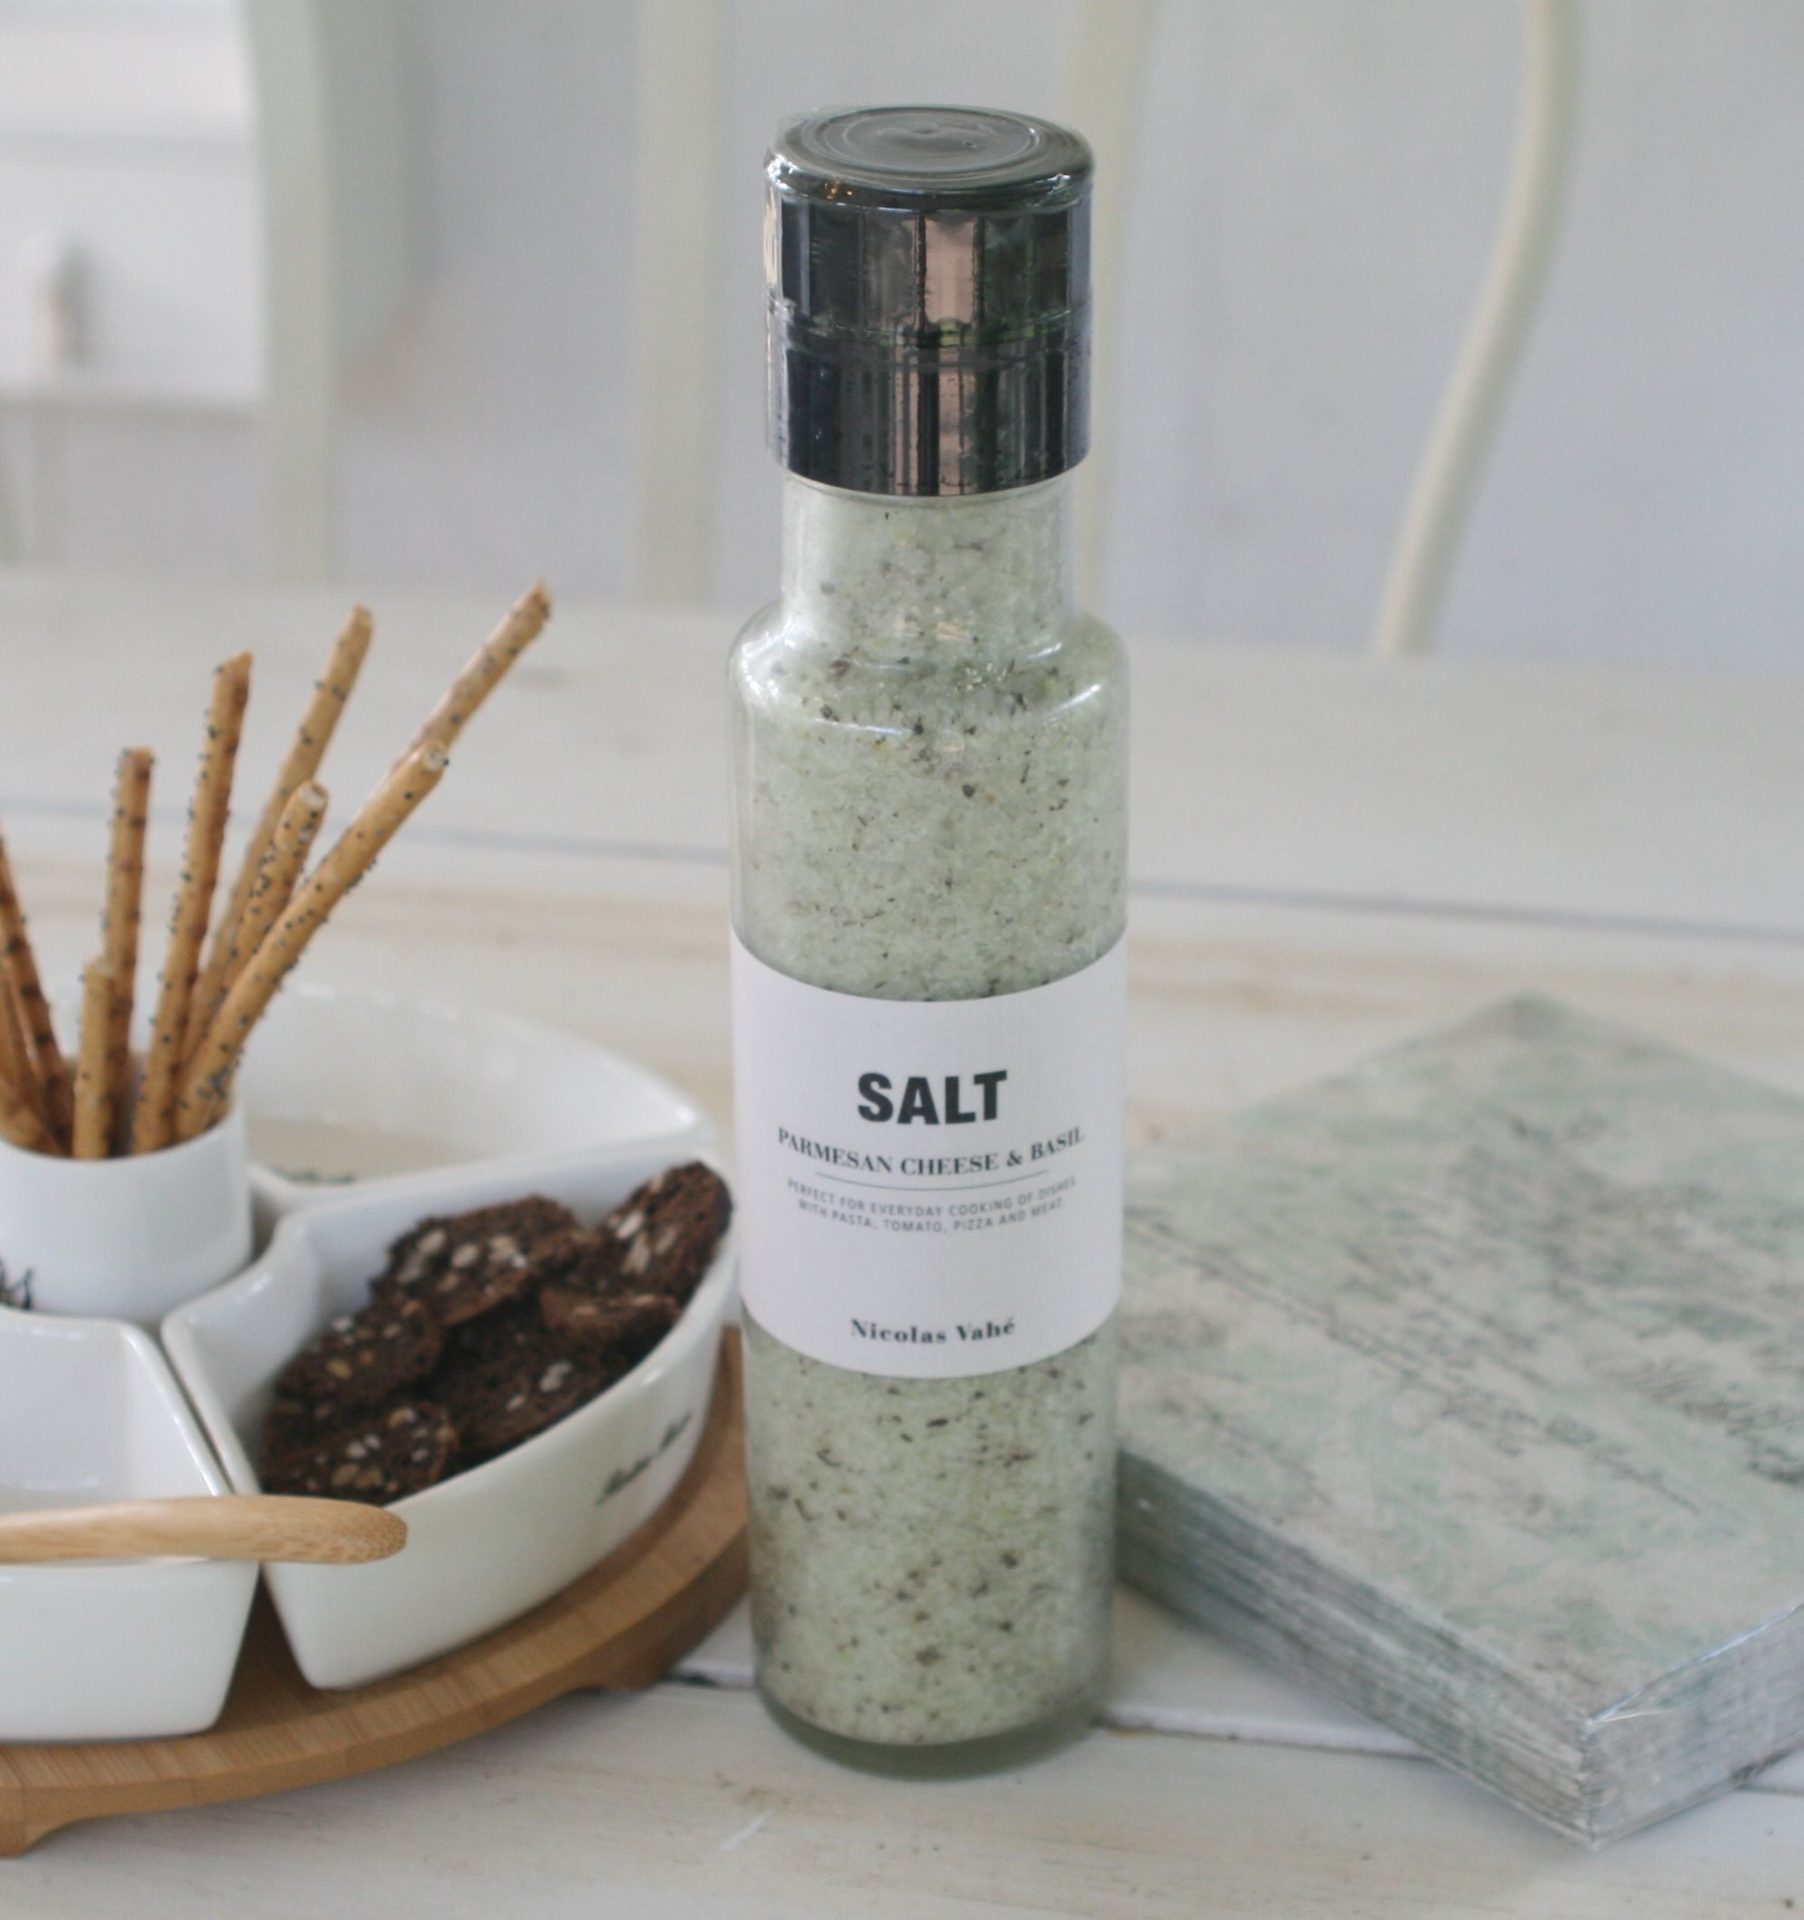 Salt med parmesan og basilikum